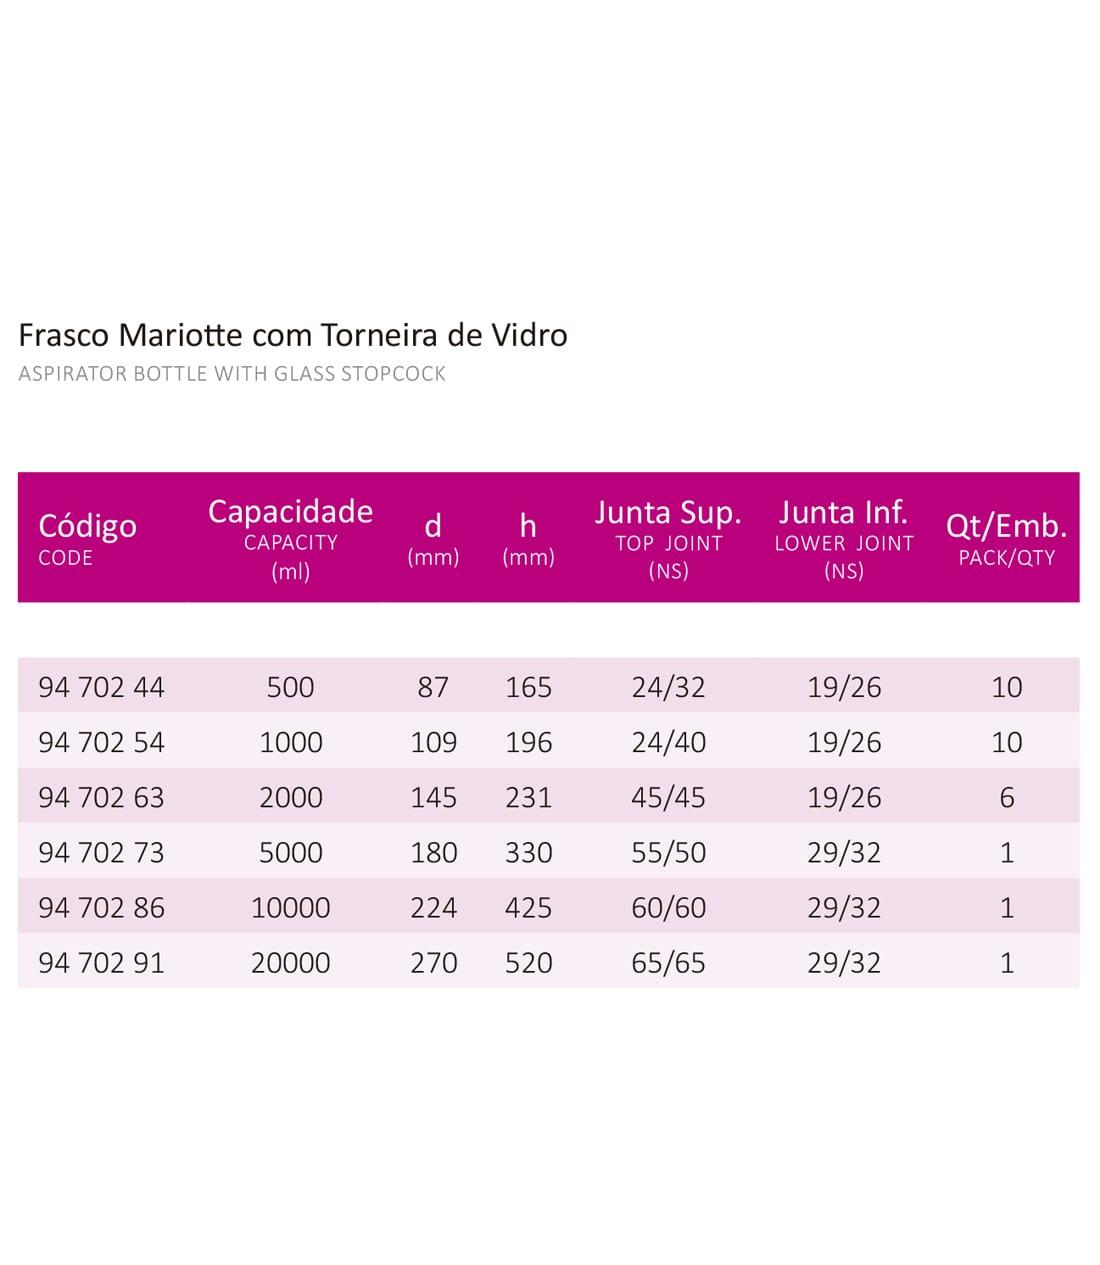 FRASCO MARIOTTE C/ J. E TORN. VIDRO 20000 ML - Laborglas - Cód. 9470291